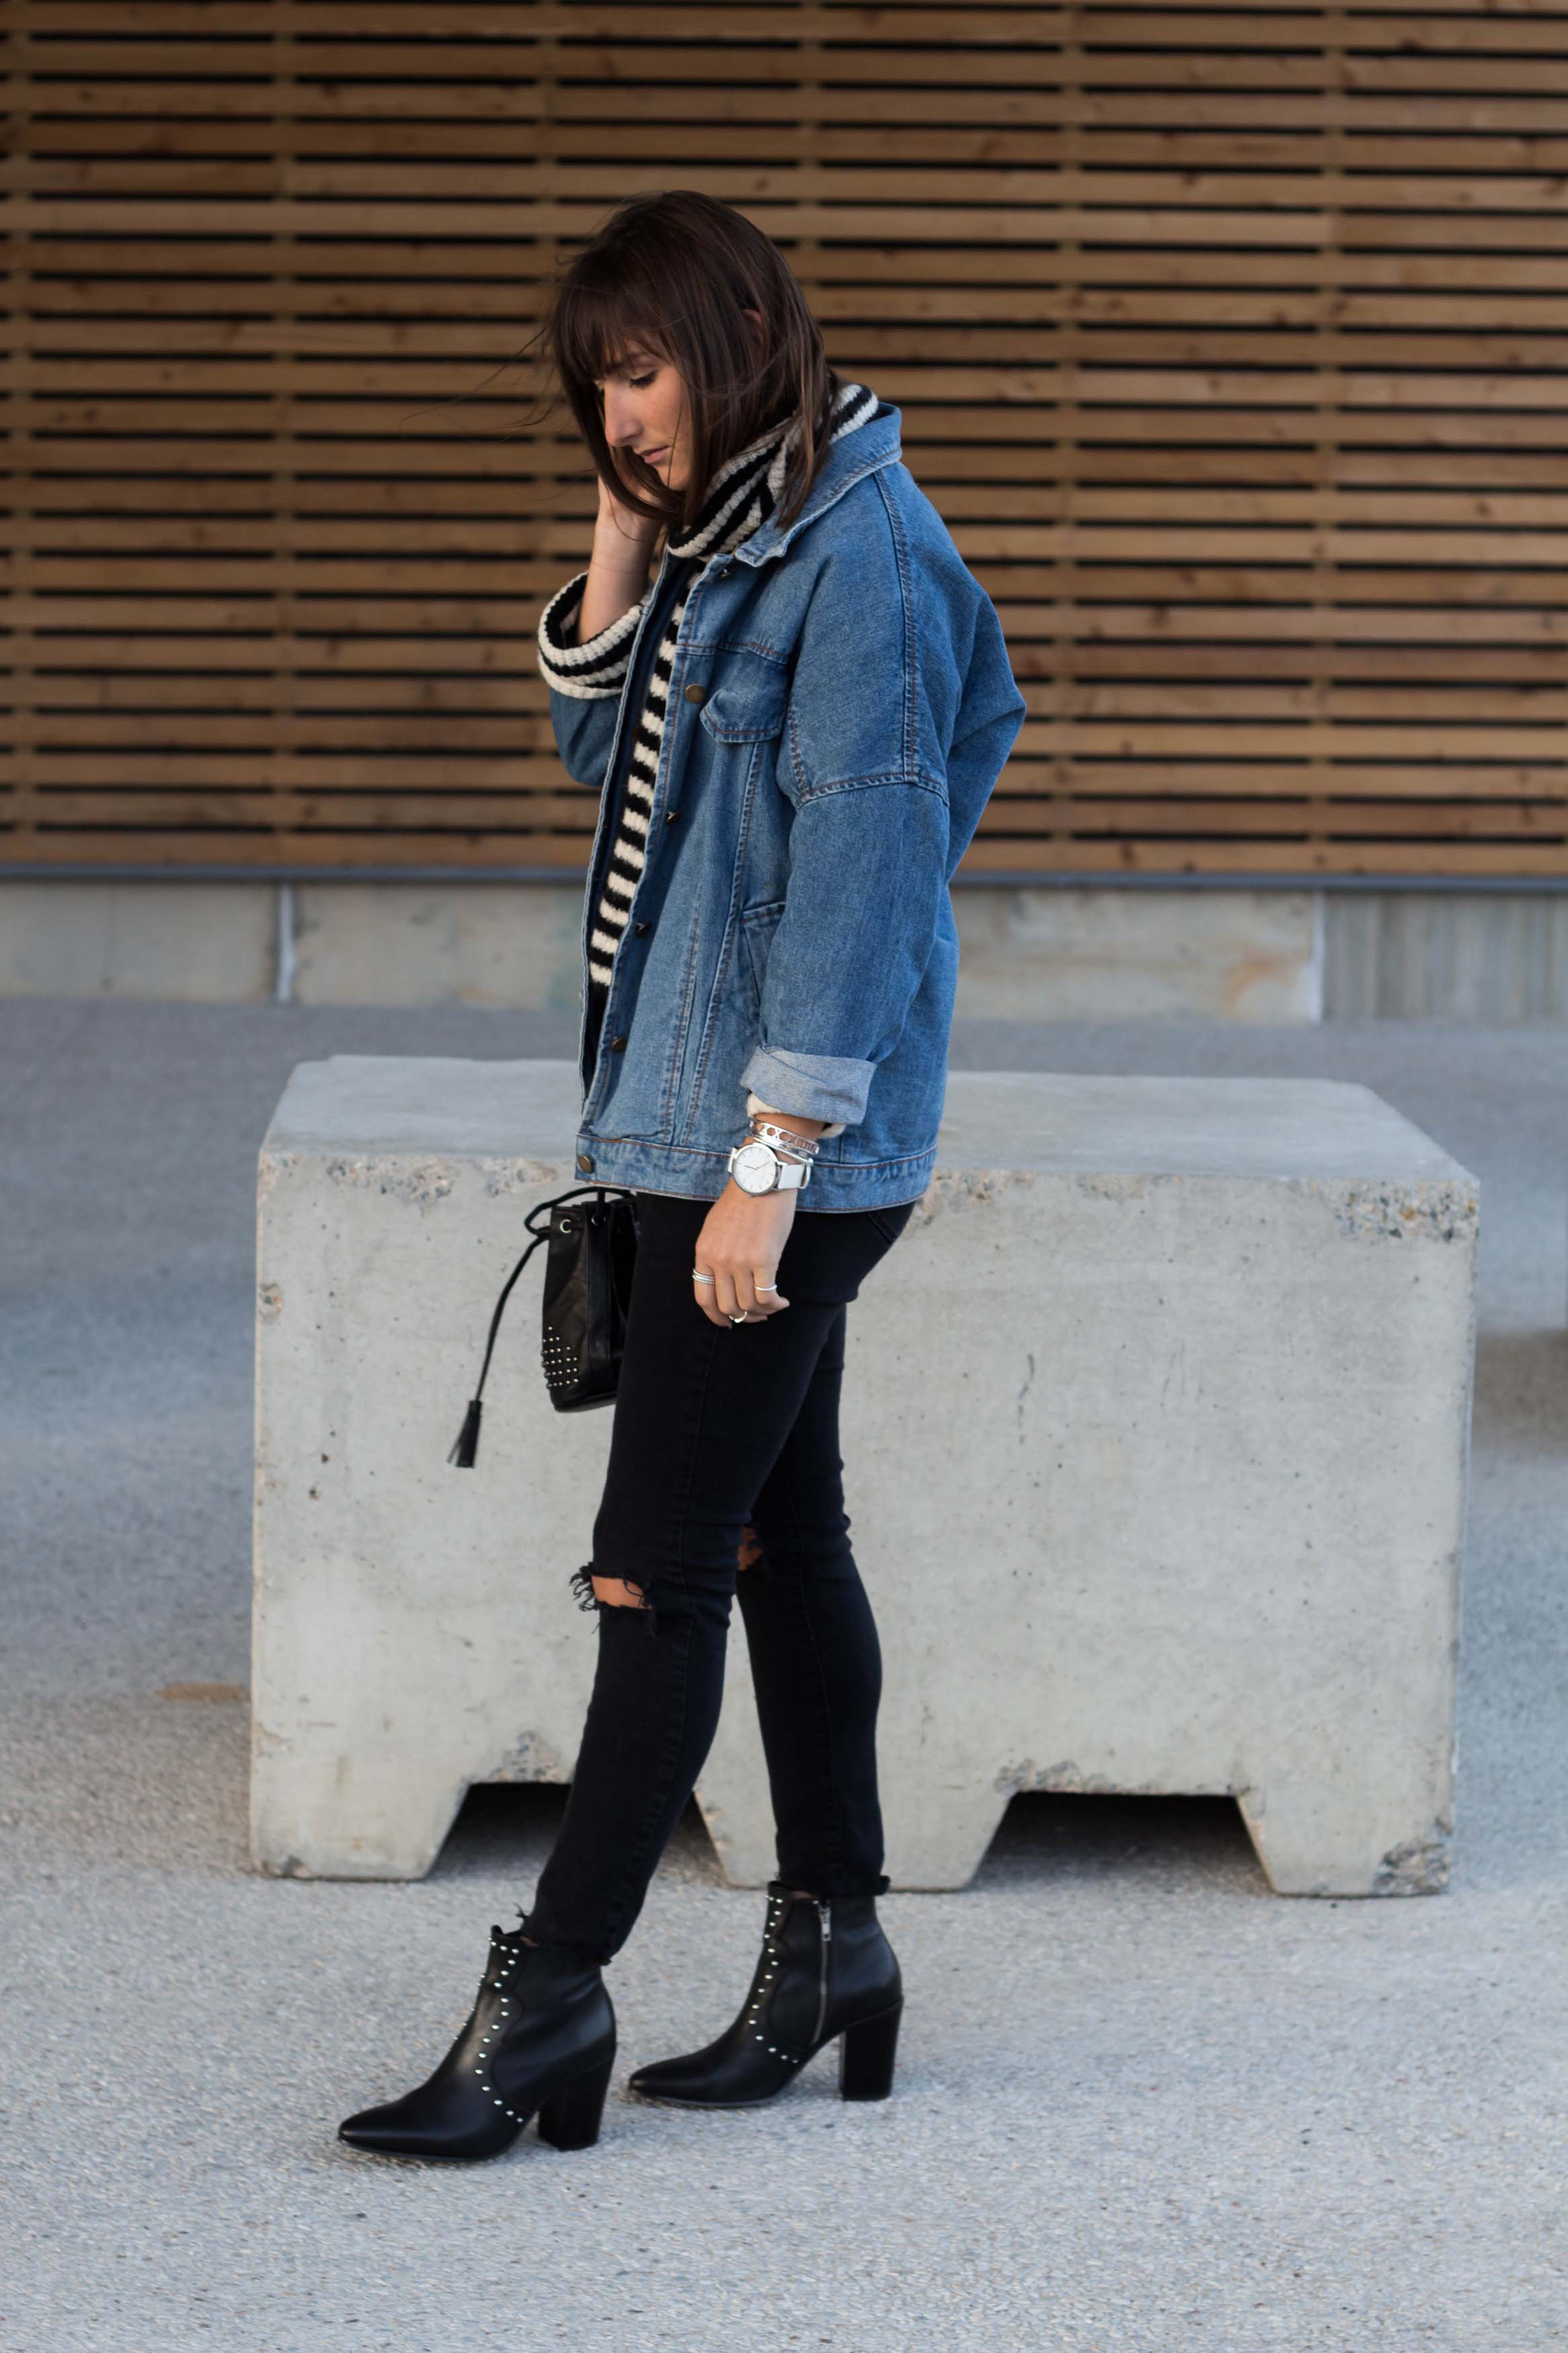 blog-mode-jean-shein-linstantflo-5-sur-18